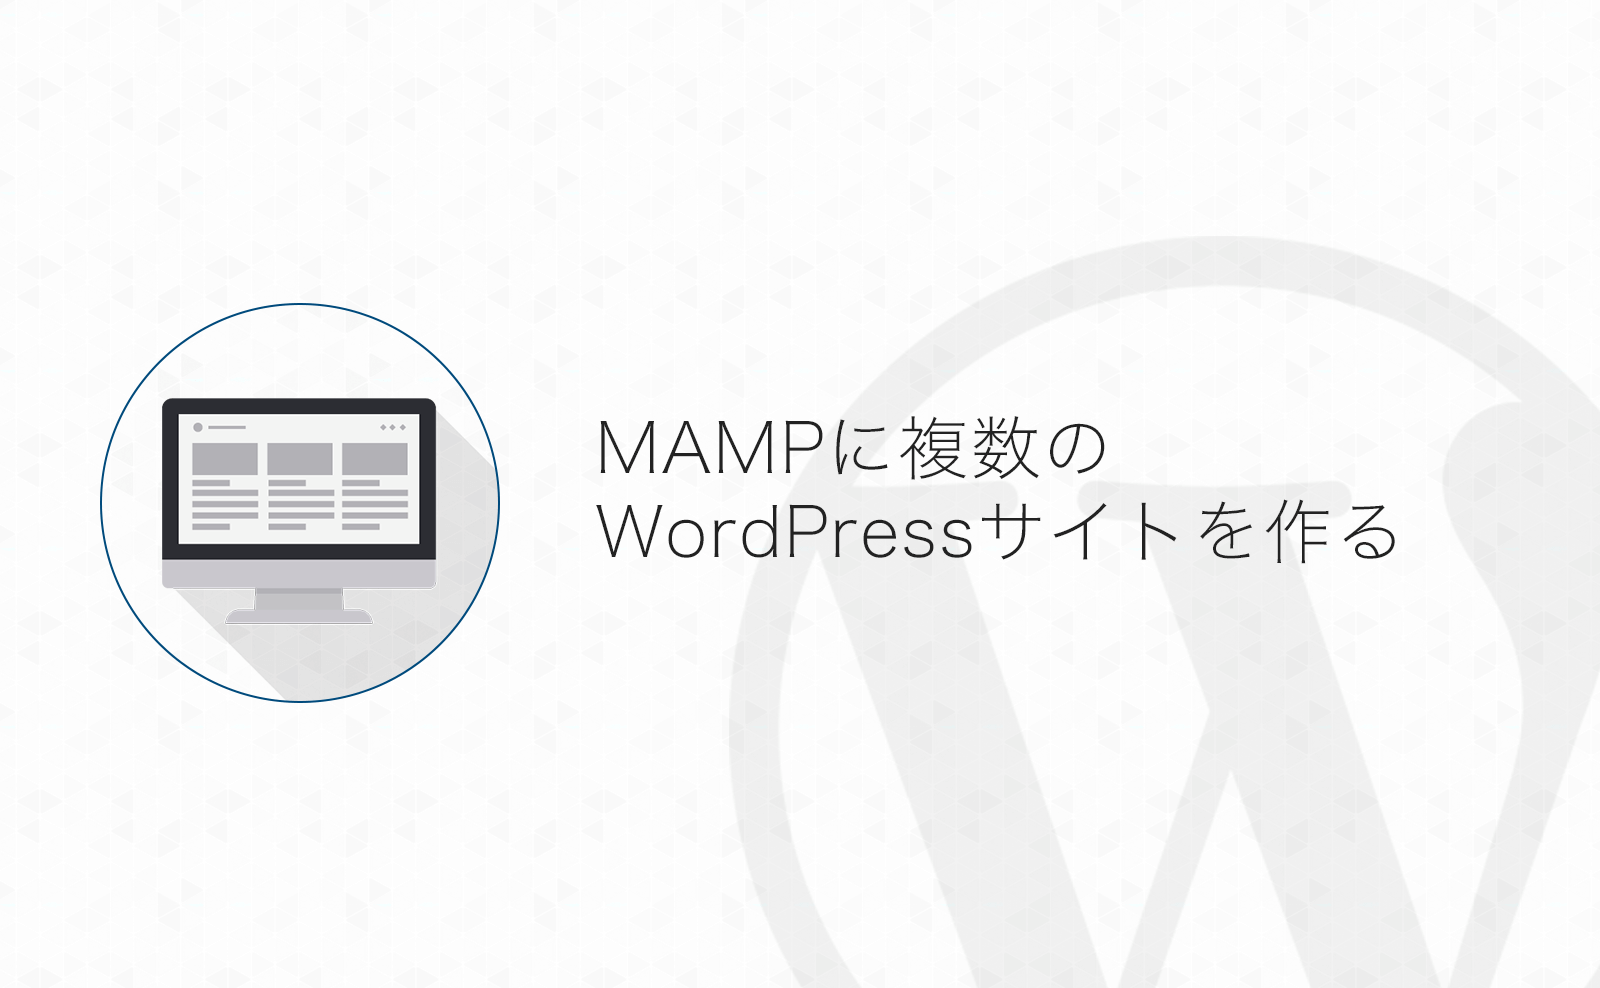 MAMPで複数のWordPress開発環境を「簡単に」作る方法